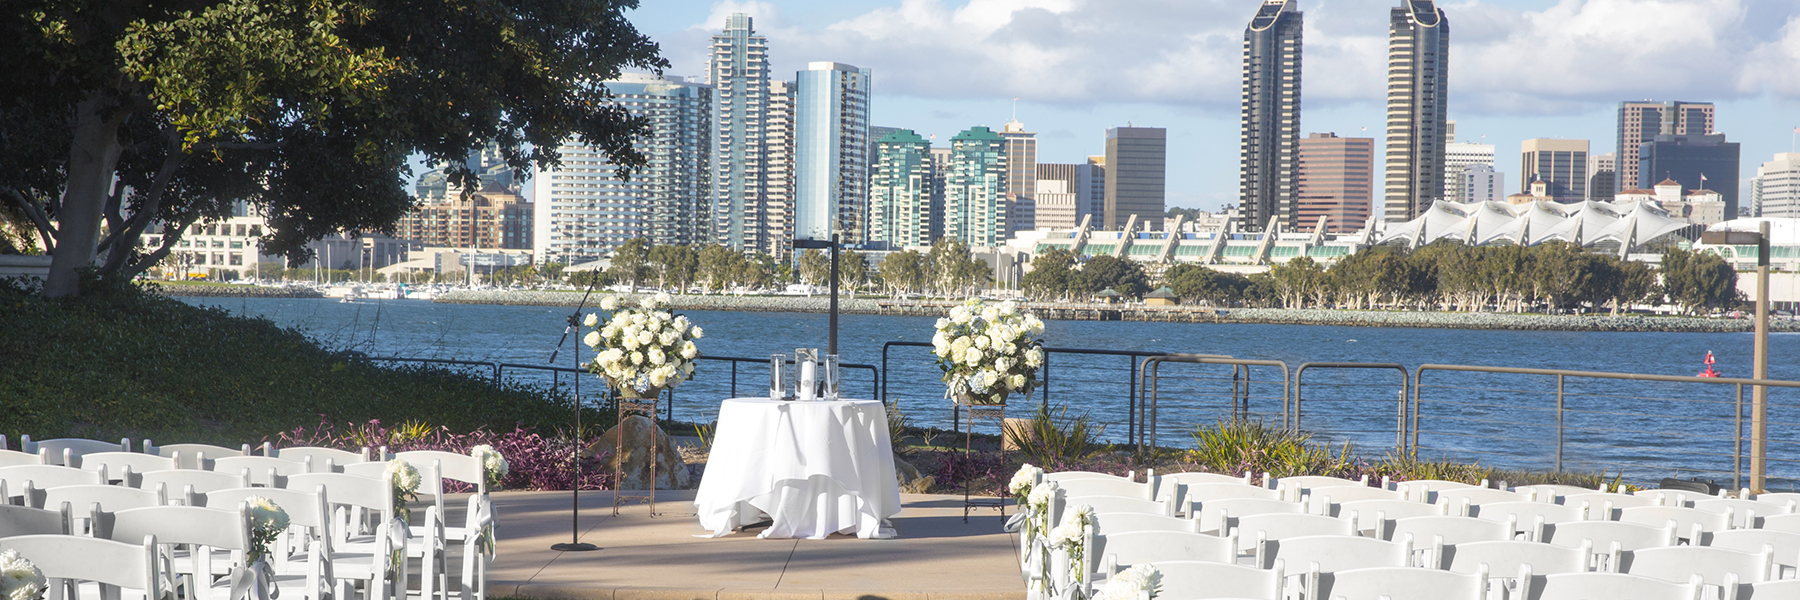 Wedding spot top southern california wedding venues for 2016 for Best california wedding venues